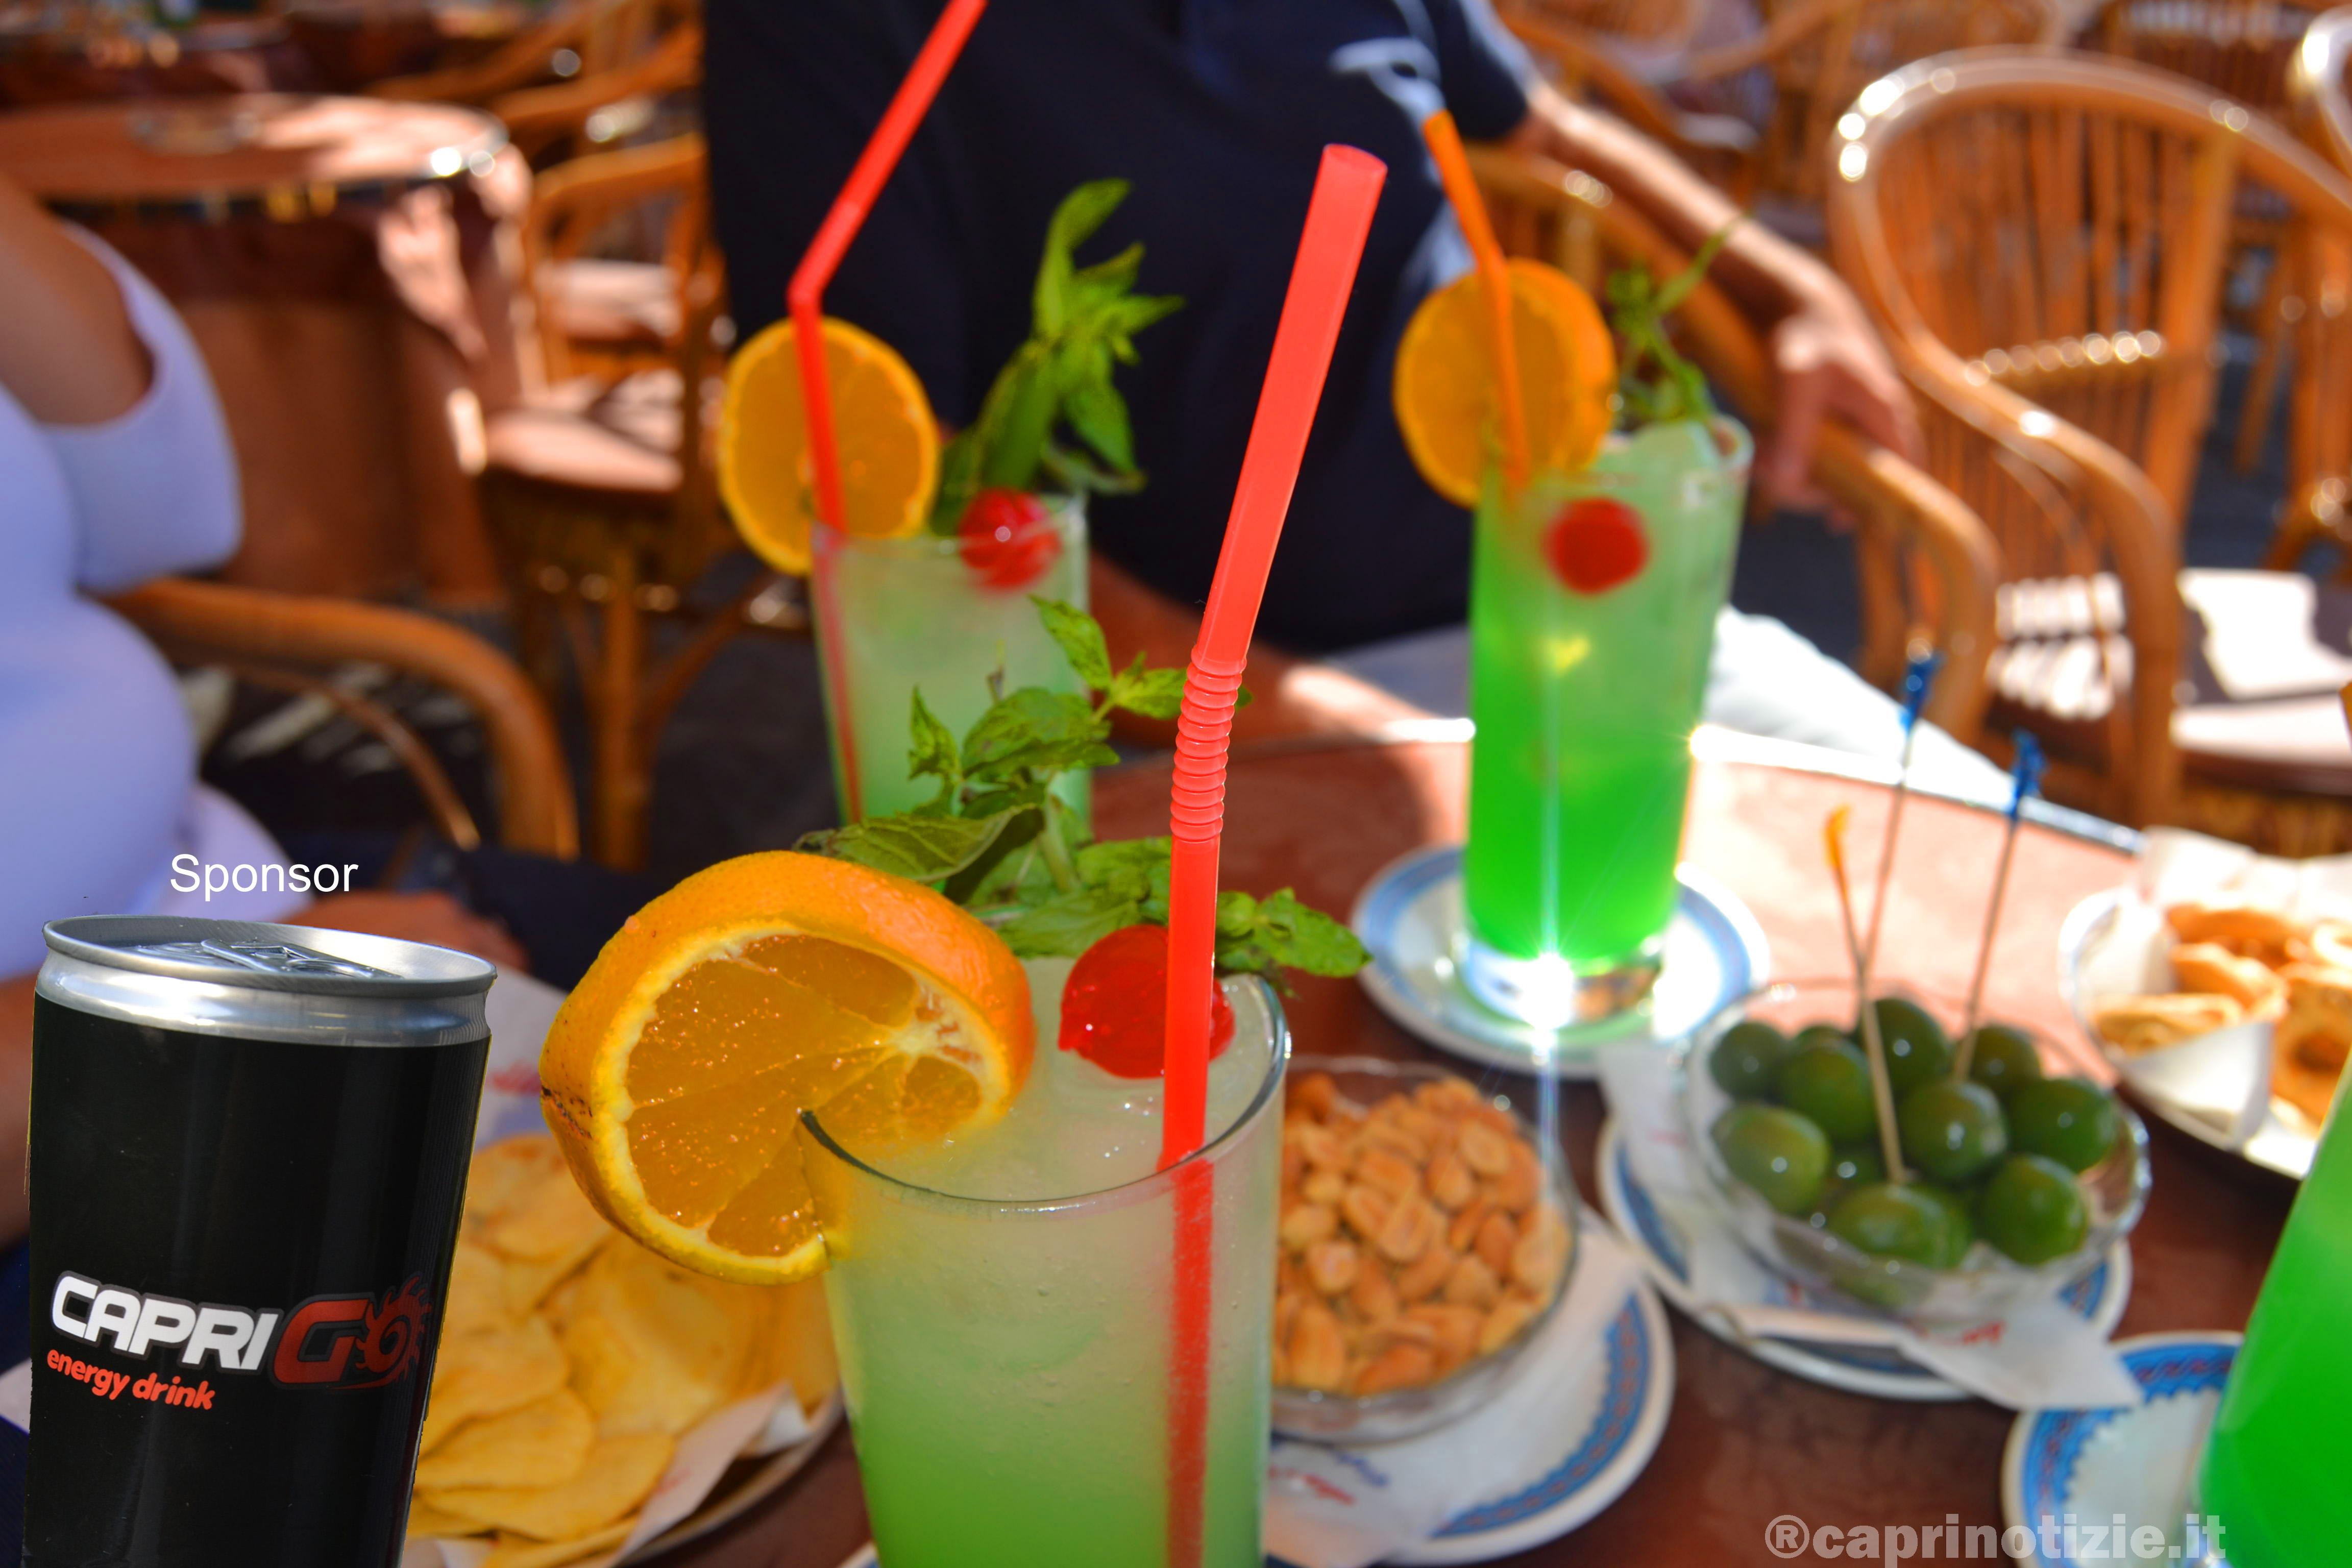 Capri ore 19:50 aperitivo in piazzeta